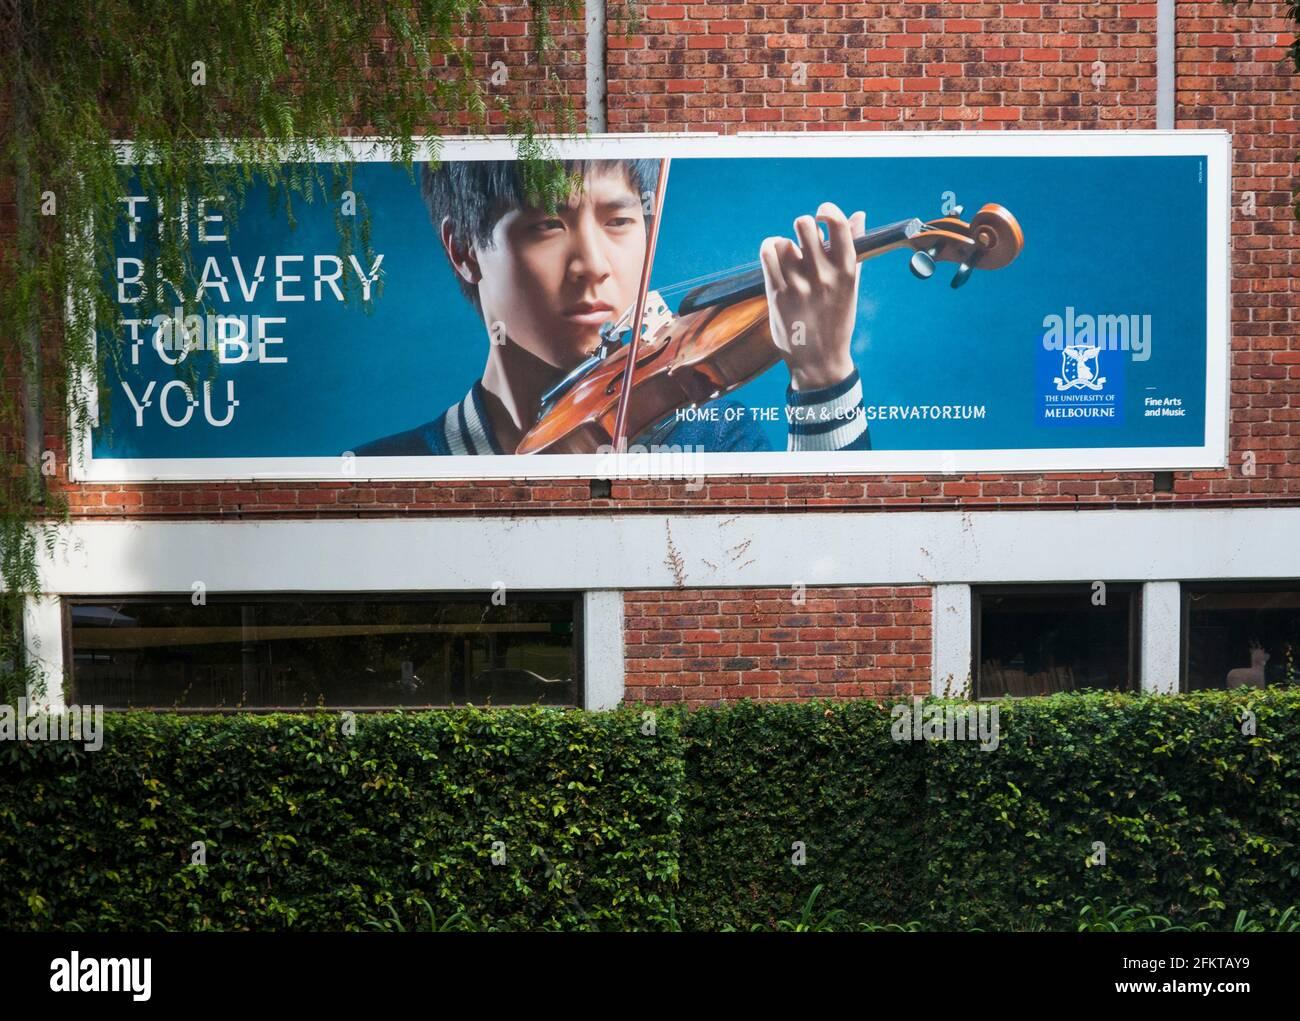 Student recruitment banner, Victorian College of the Arts and Conservatorium, Melbourne, Australia Stock Photo